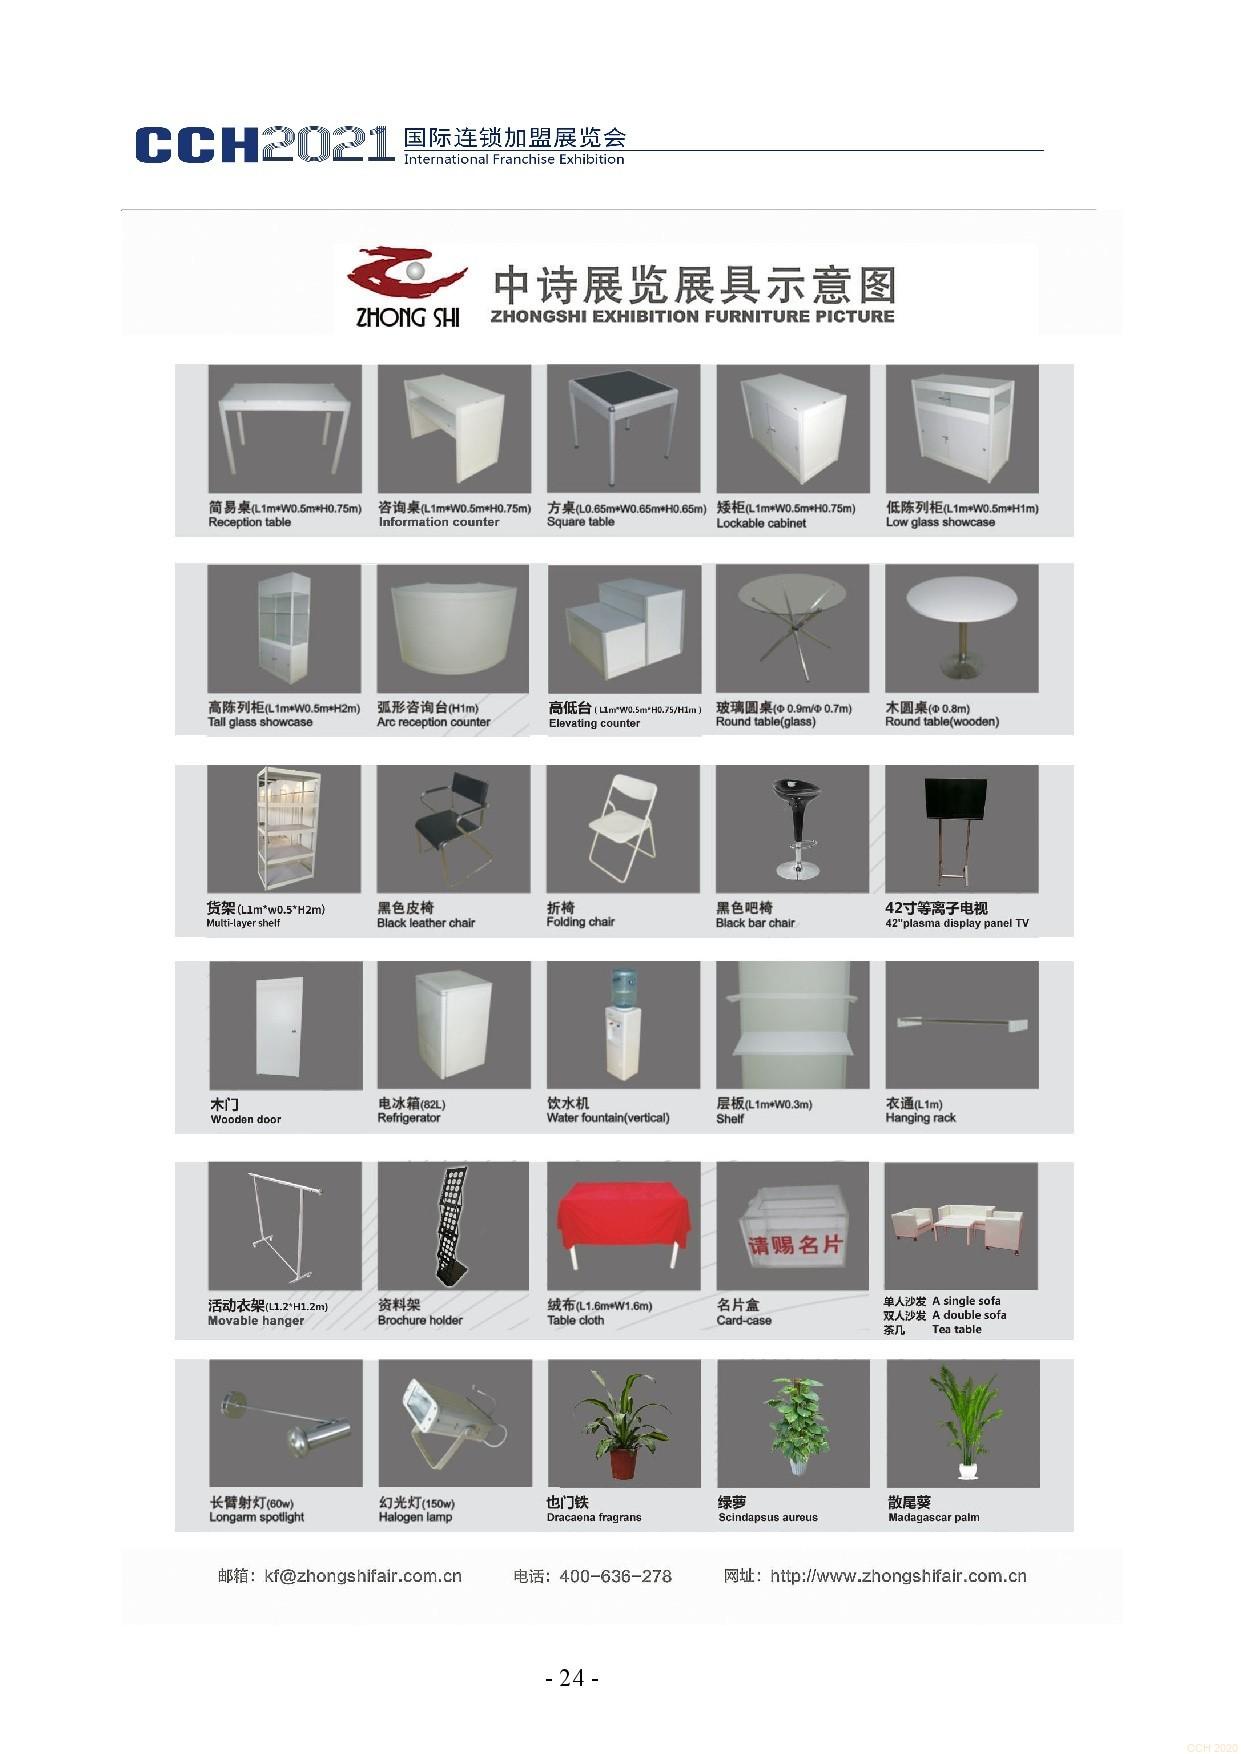 0416CCH深圳展参展商手册4.16-024.jpg